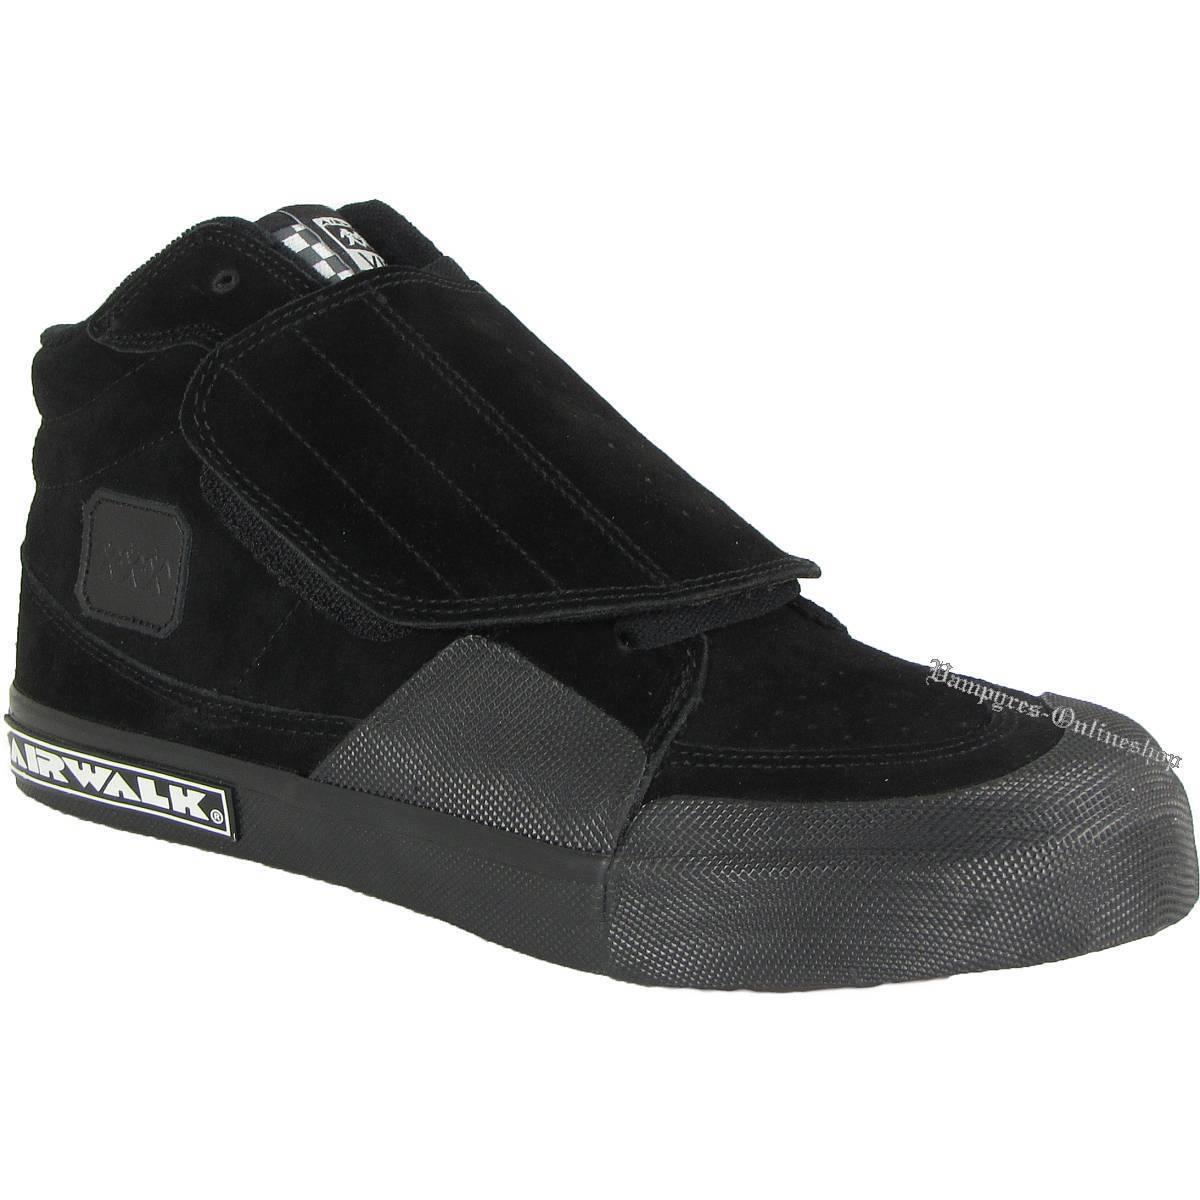 Airwalk VIC 8-Loch Schwarz Sneaker Black Turnschuhe Noir Skateschuhe Nero Klett